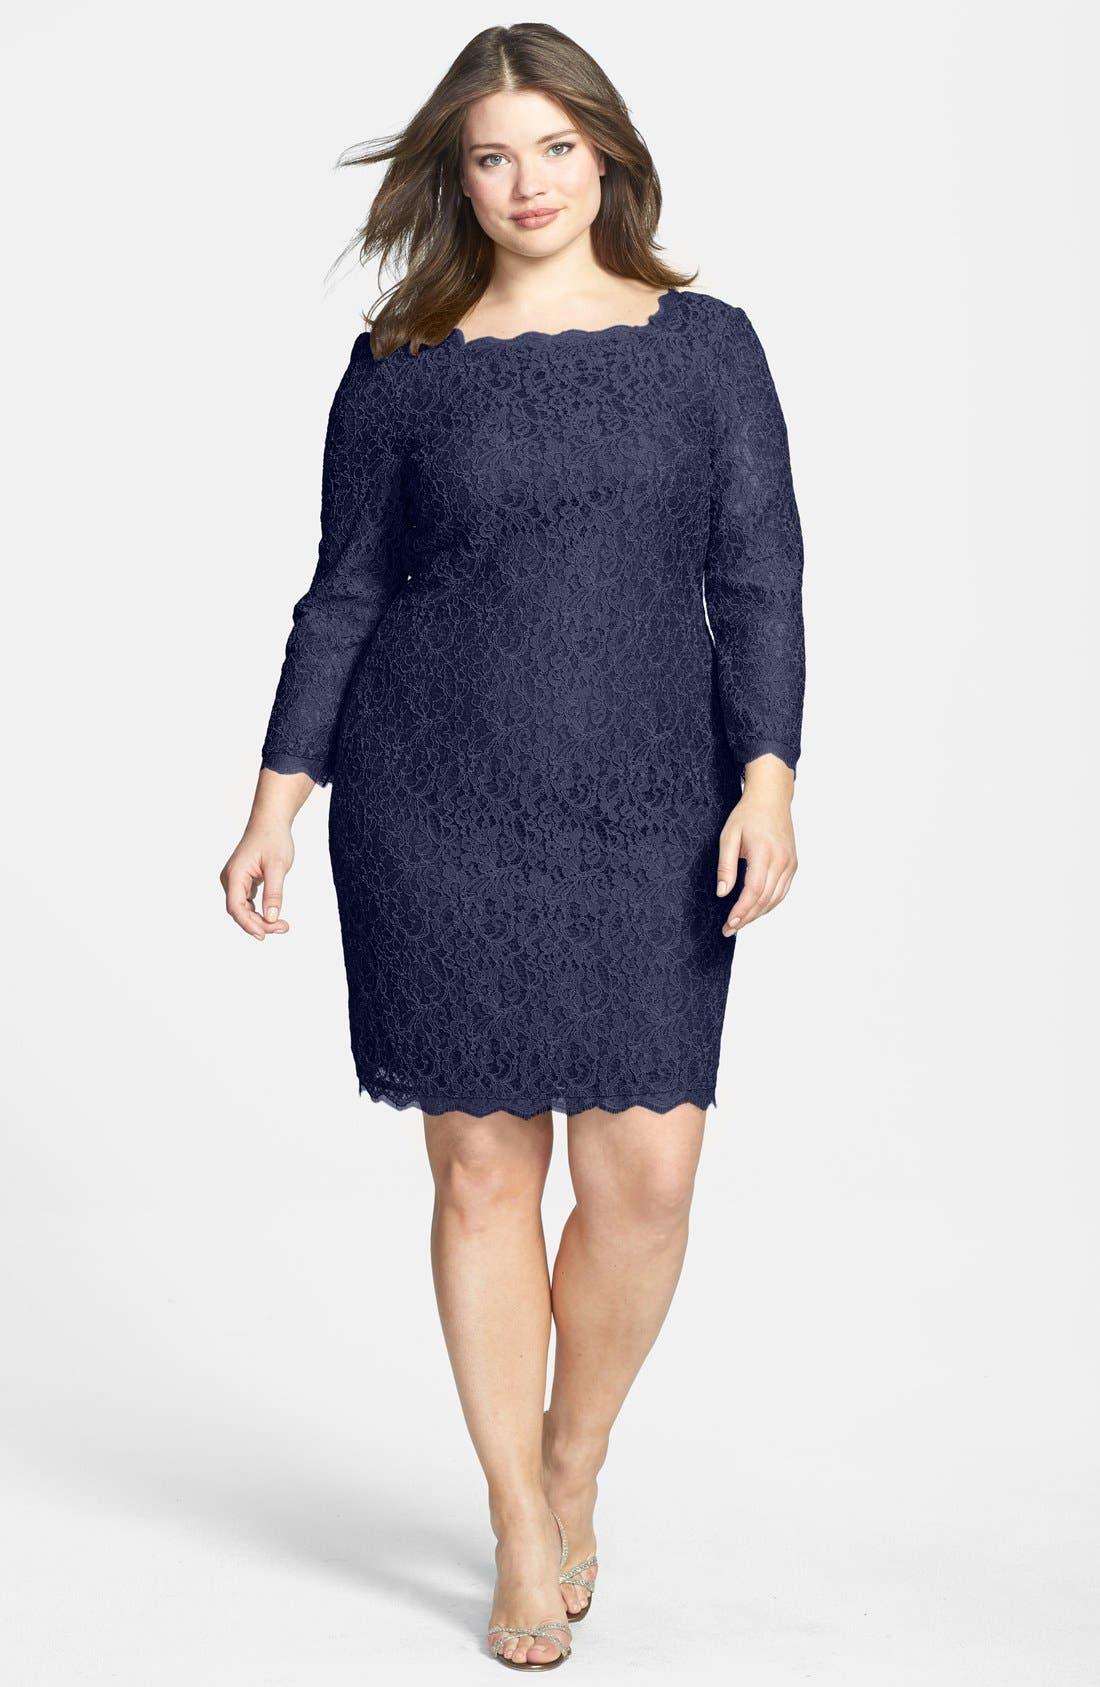 Main Image - Adrianna Papell Lace Overlay Sheath Dress (Plus Size)